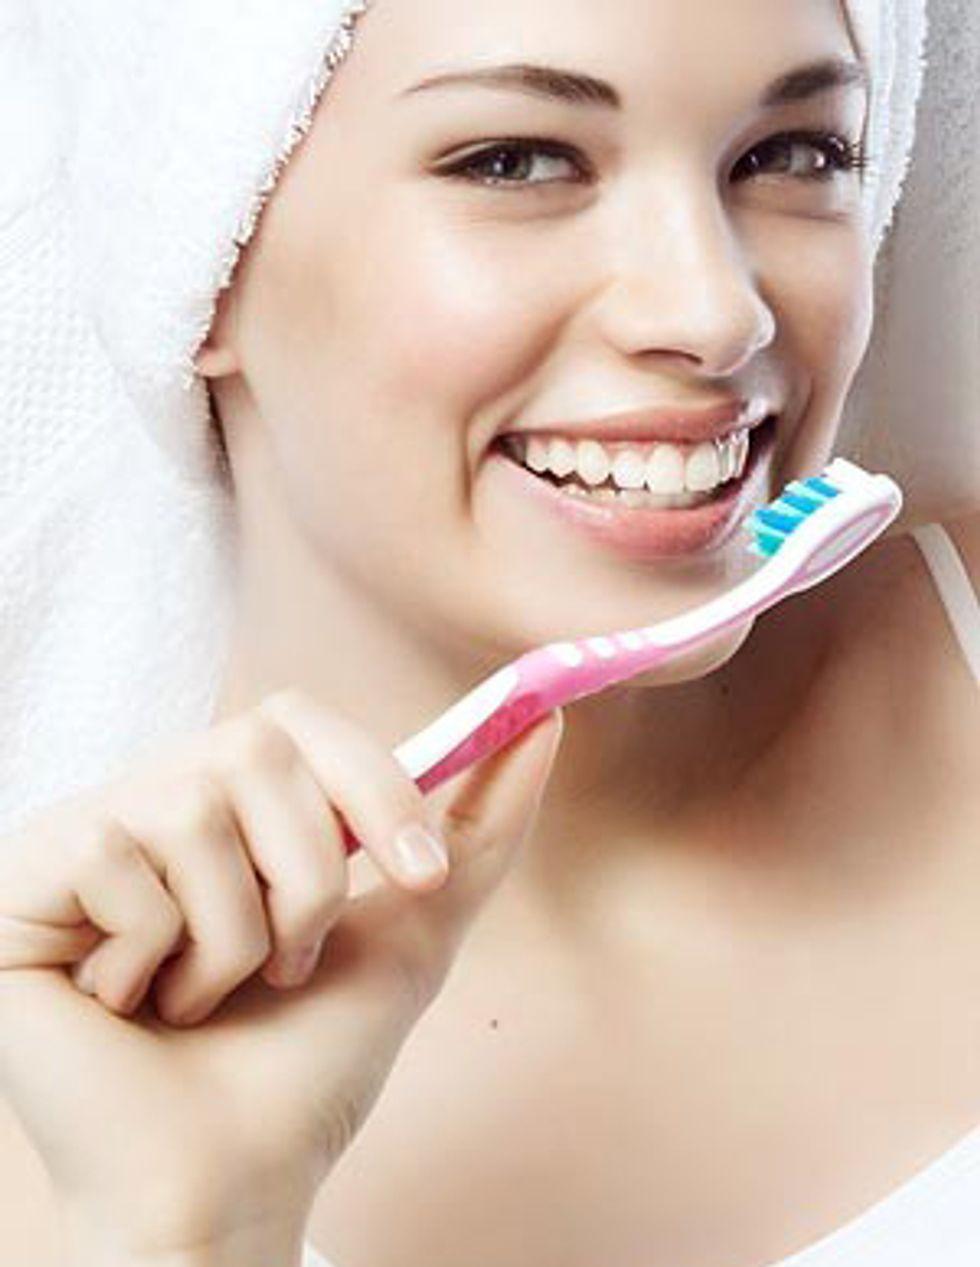 8 Bad Brushing Habits That Harm Your Teeth